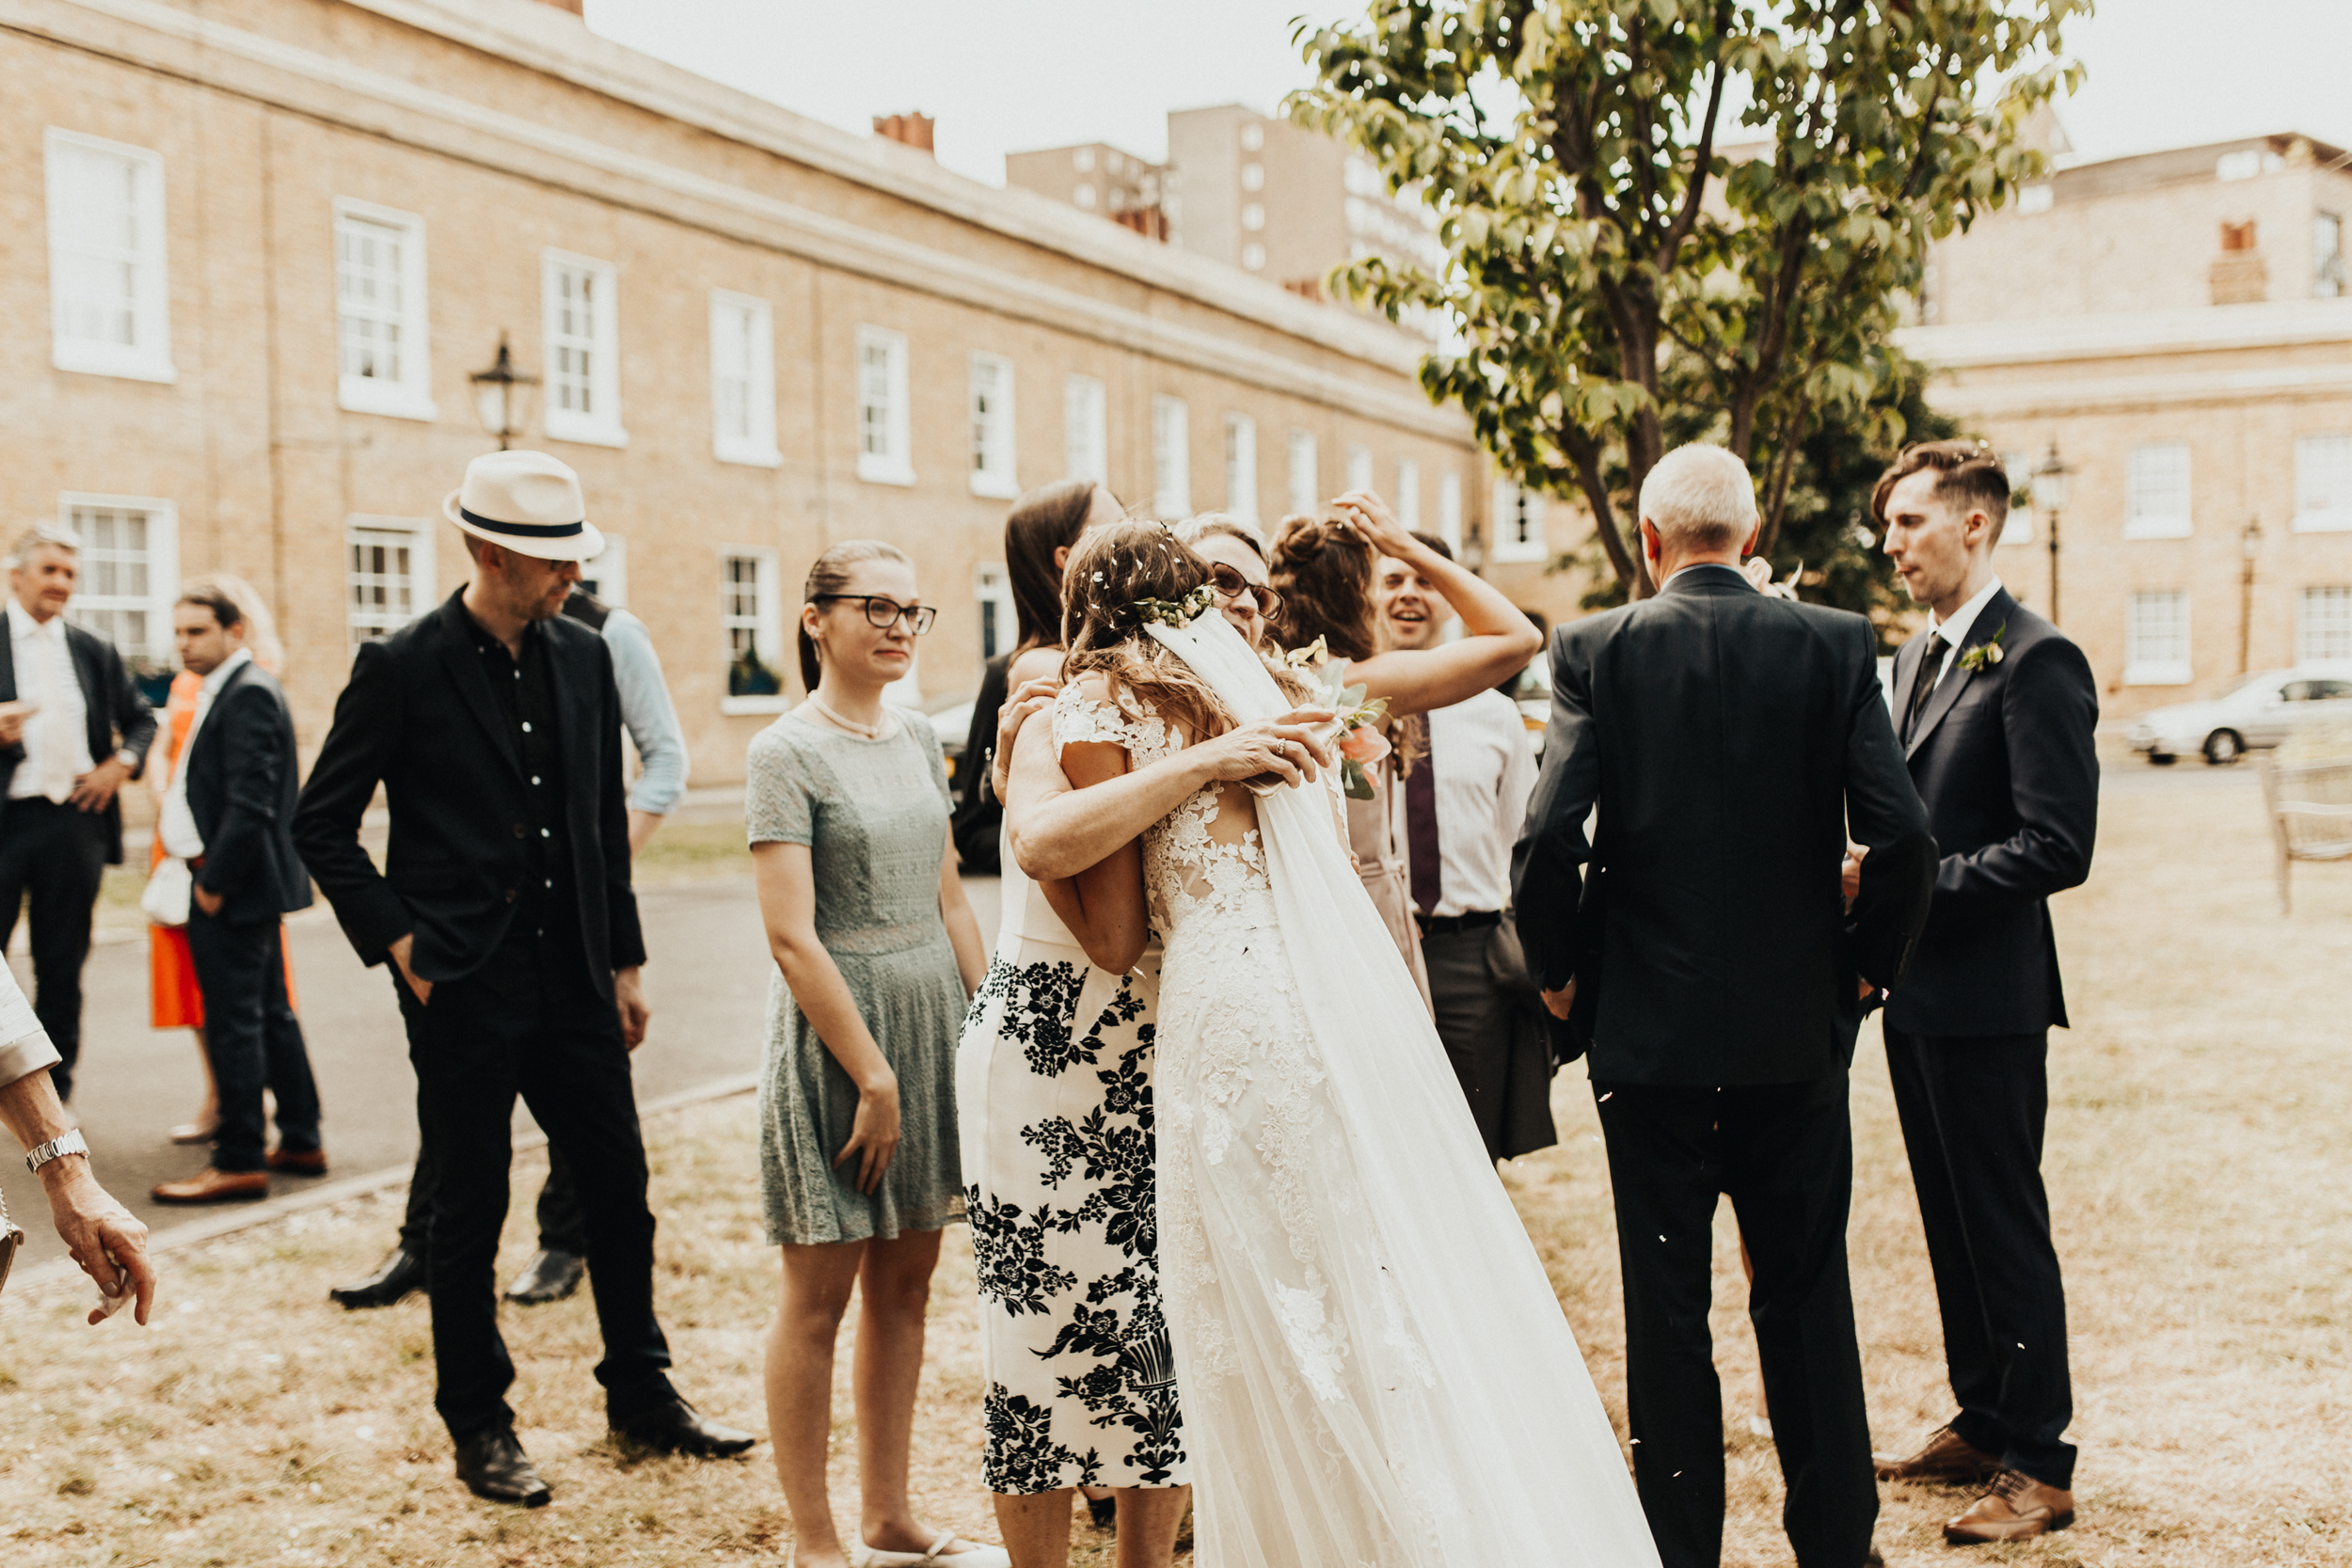 Laura-Benn-The-Asylum-London-The-Ace-Hotel-Wedding-Alternative-Darina-Stoda-Photography-272.jpg